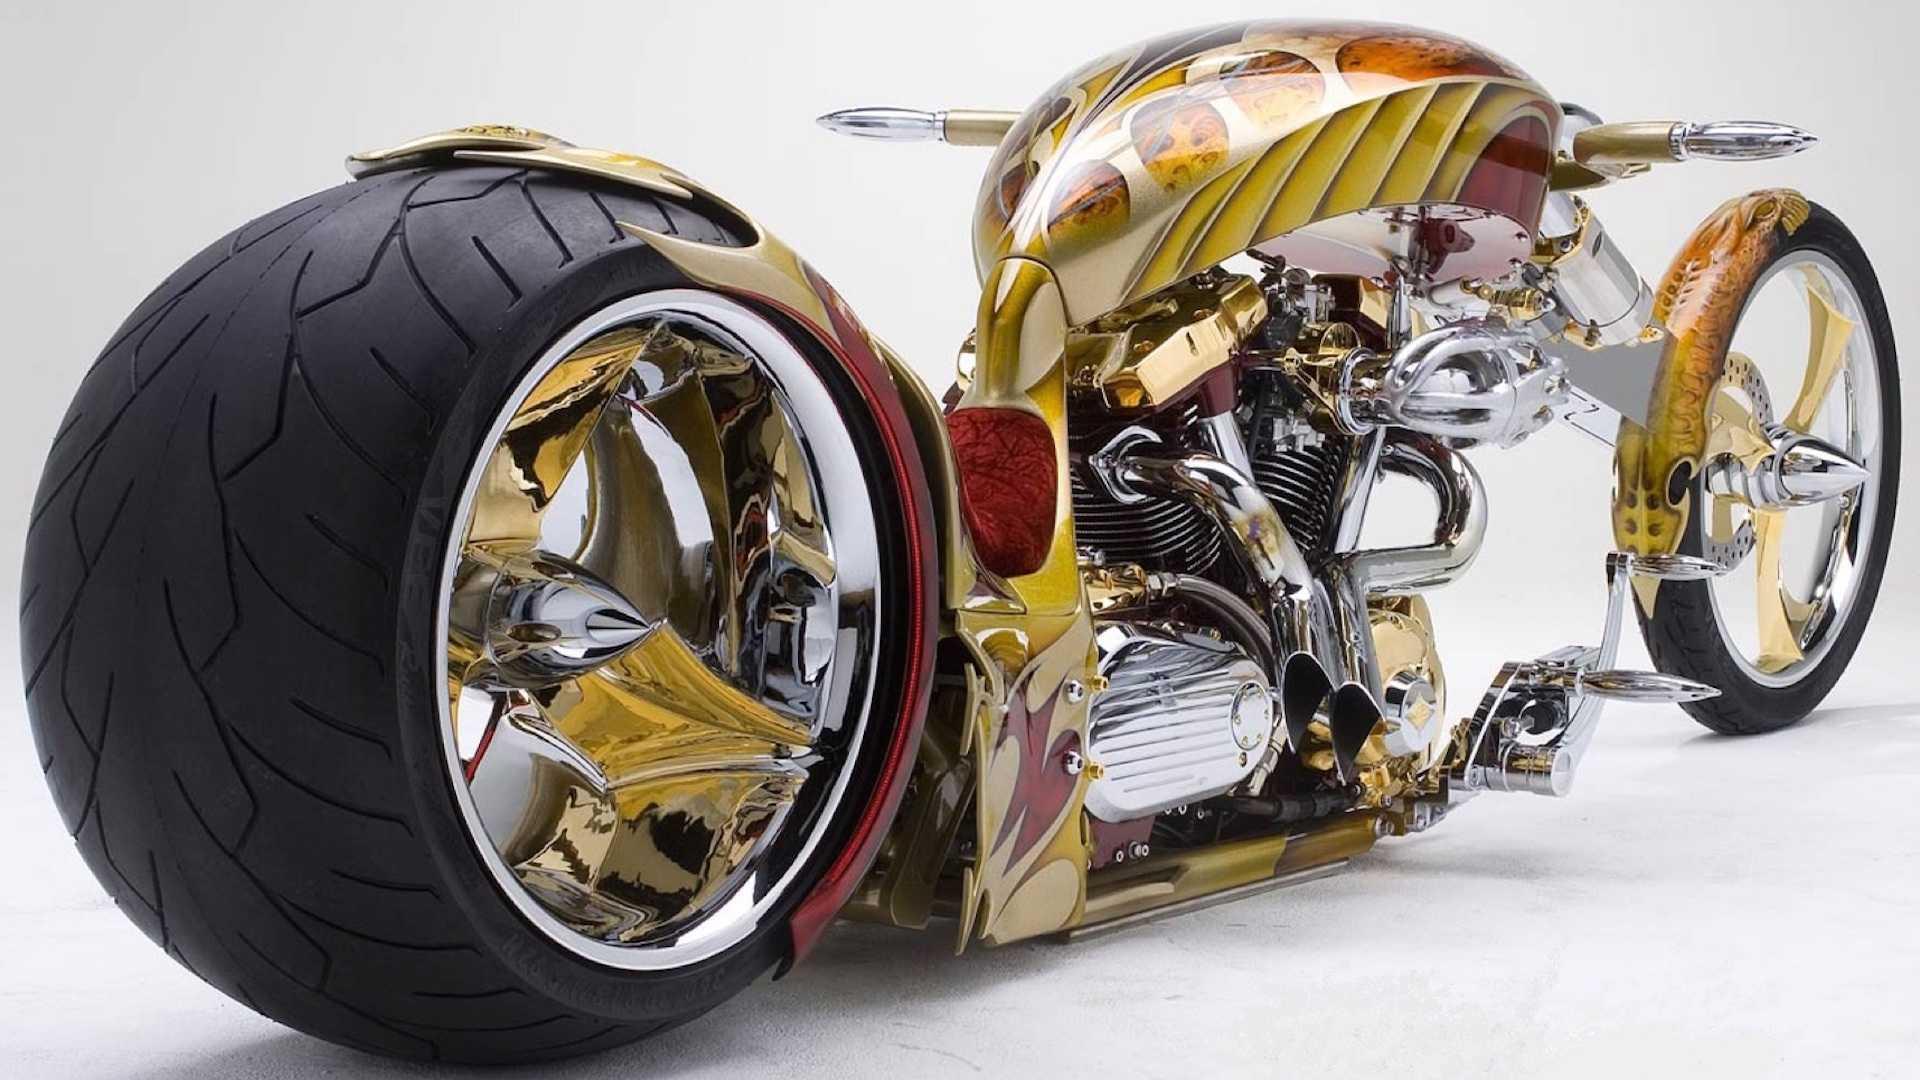 Nehmesis, Chopper Amerika Cita Rasa Yamaha